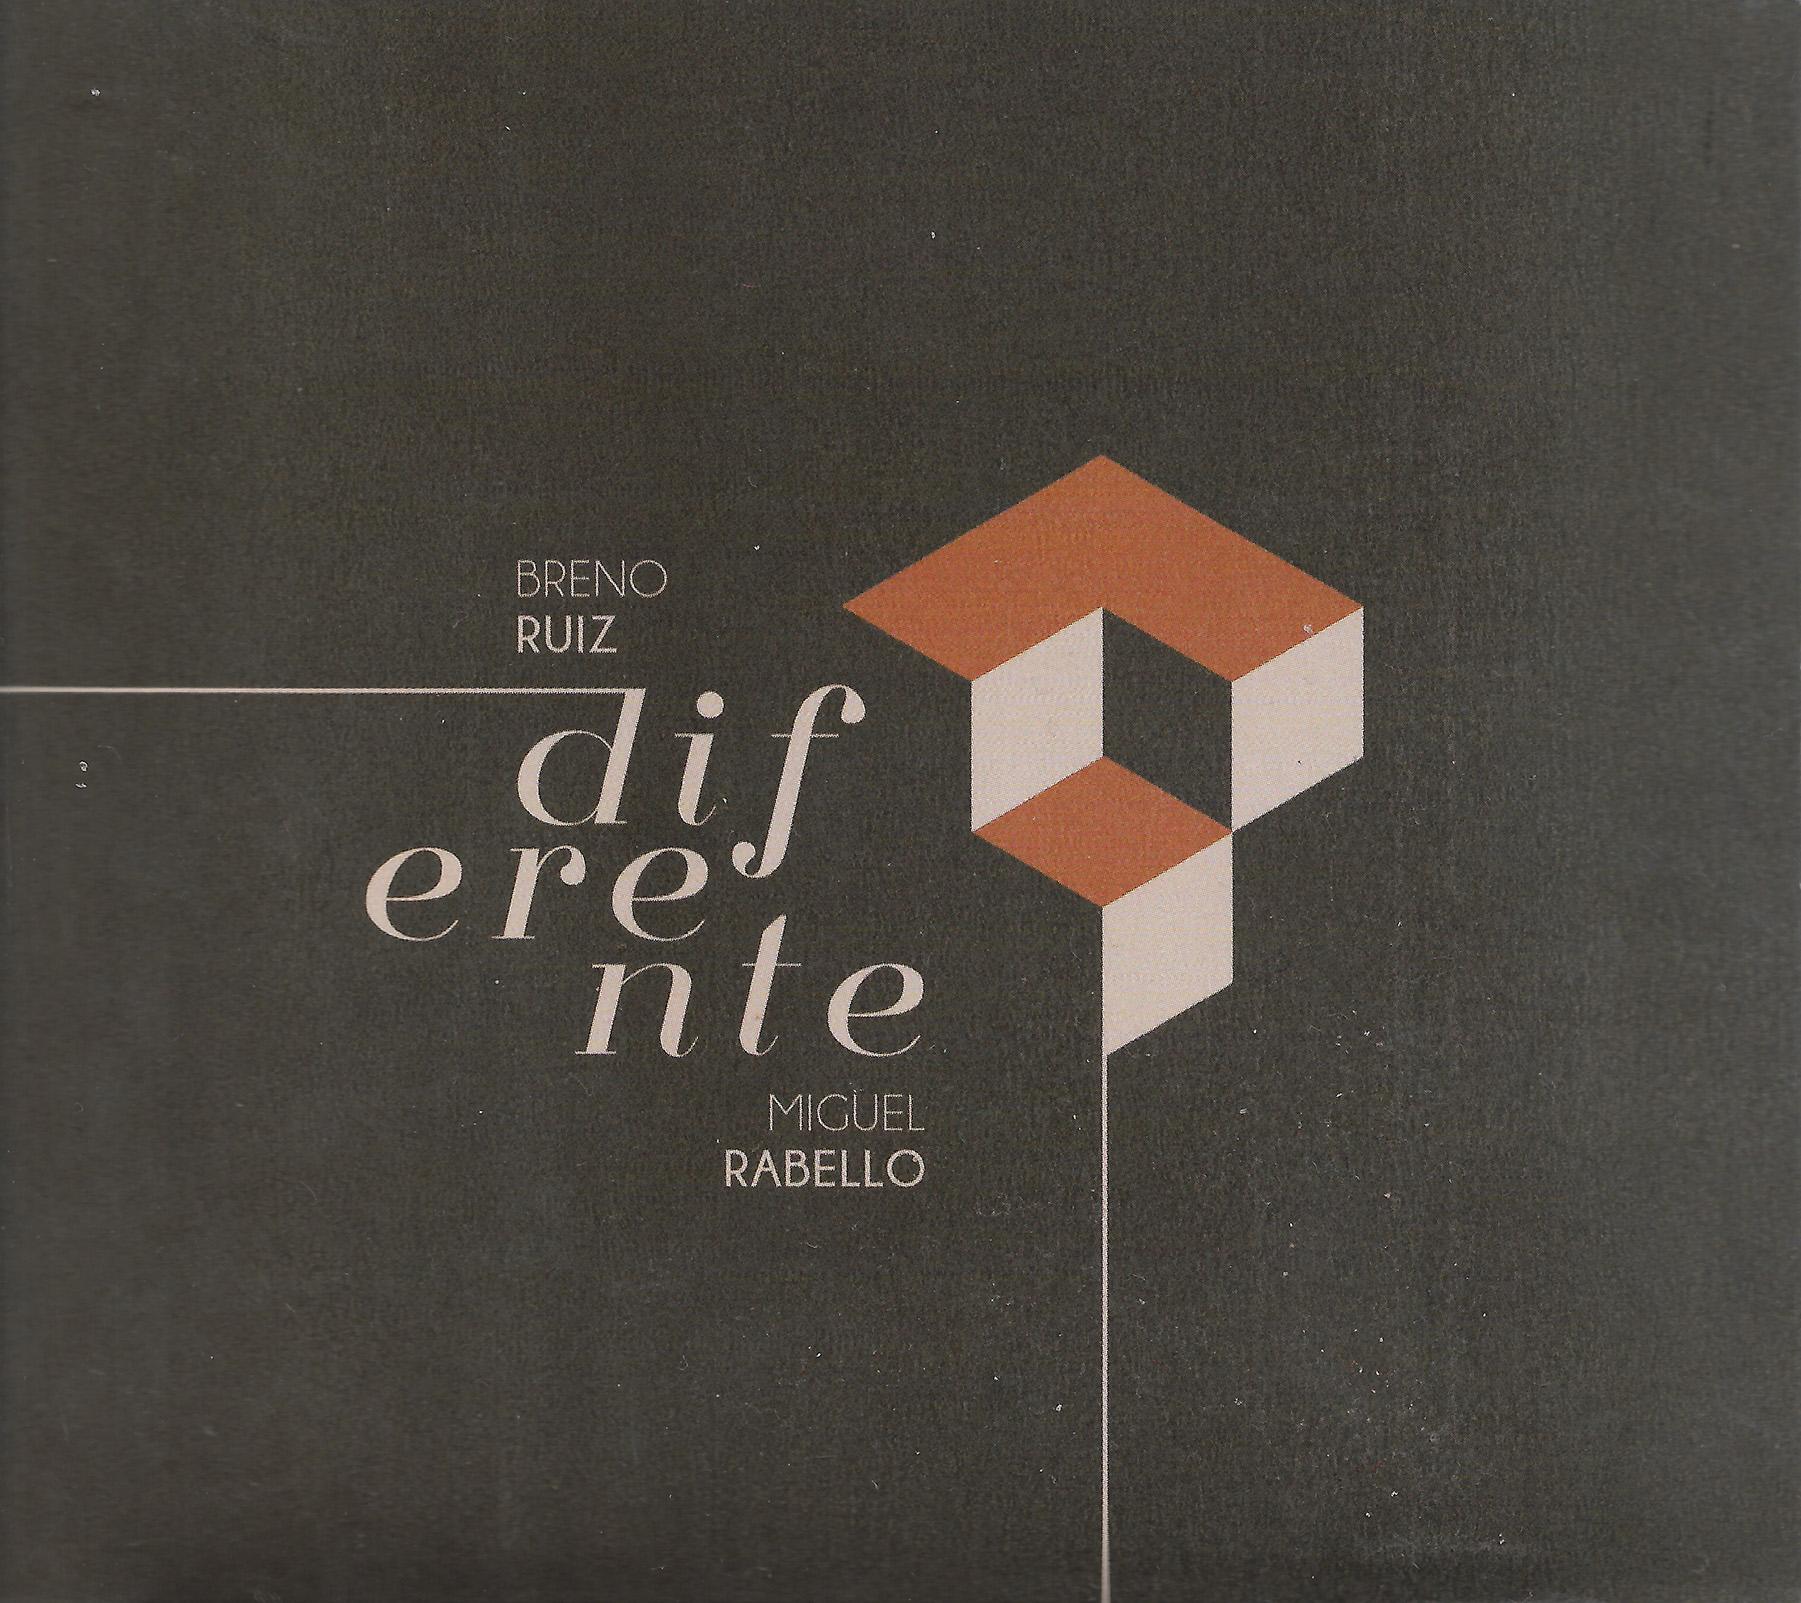 Capa CD Breno Ruiz e Miguel Rabello 002 Música que traz esperança